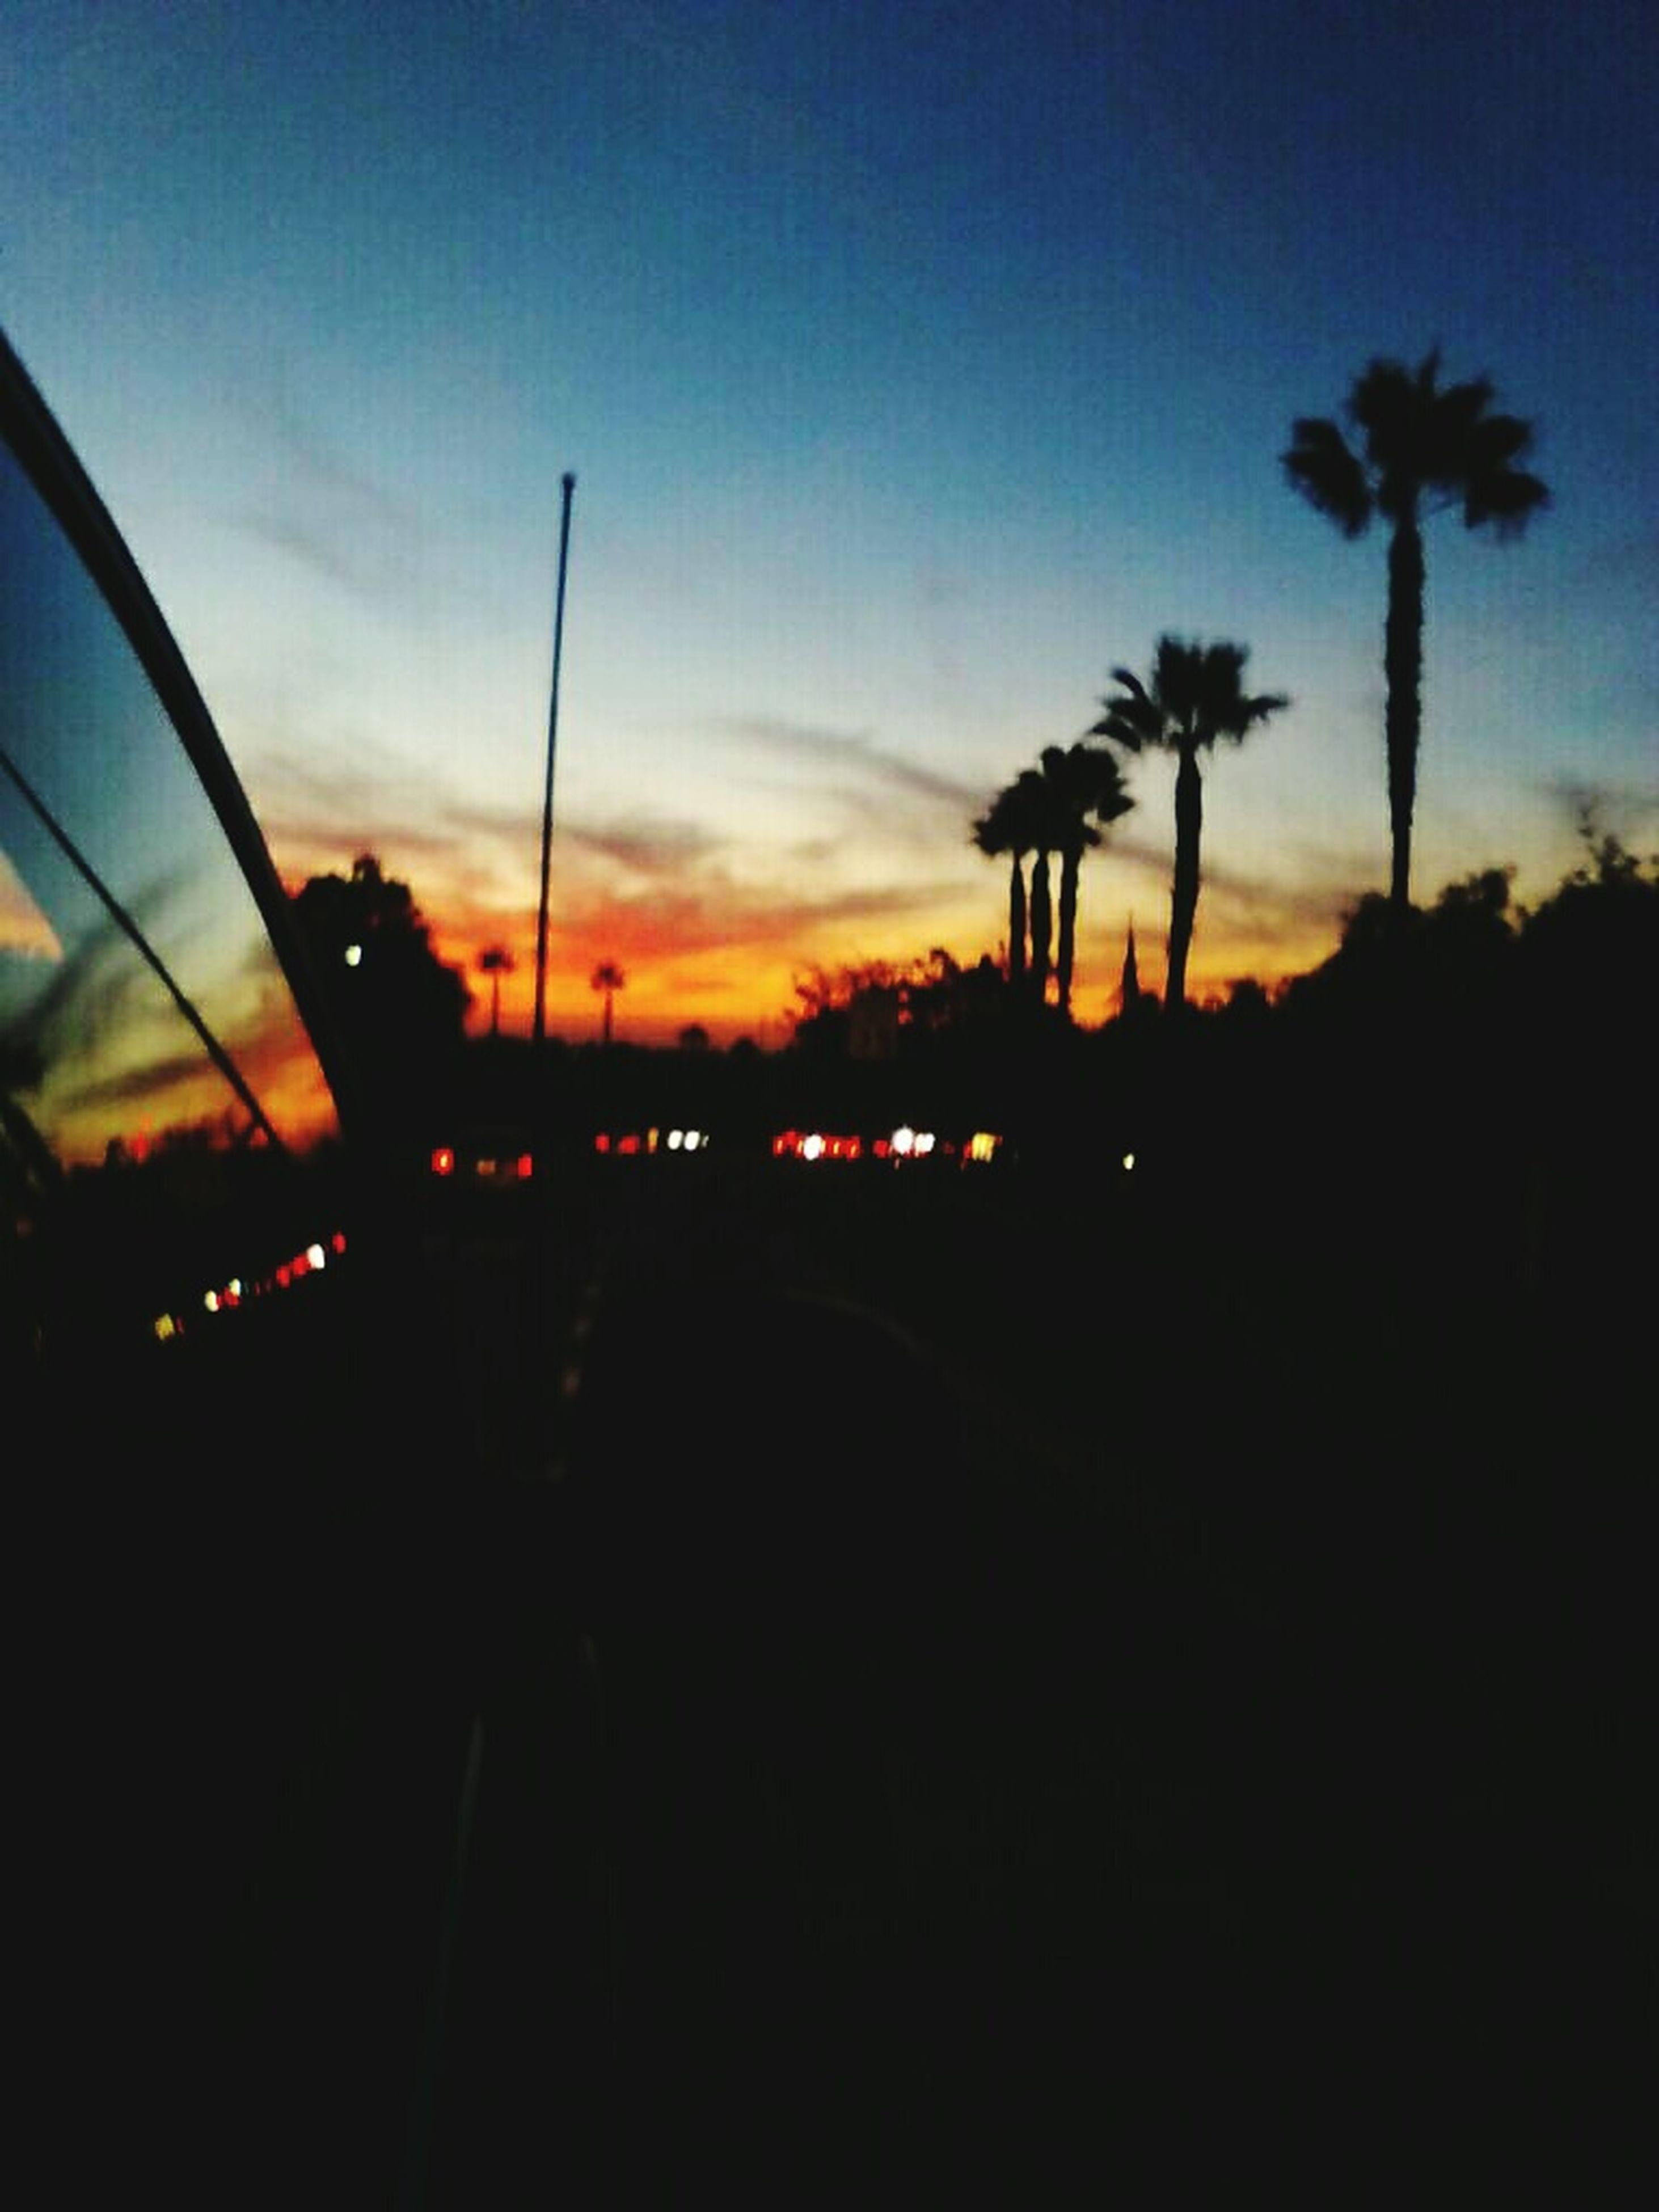 sunset, silhouette, sky, tree, transportation, palm tree, orange color, dark, dusk, cloud - sky, street light, car, illuminated, land vehicle, nature, scenics, road, cloud, tranquility, outdoors